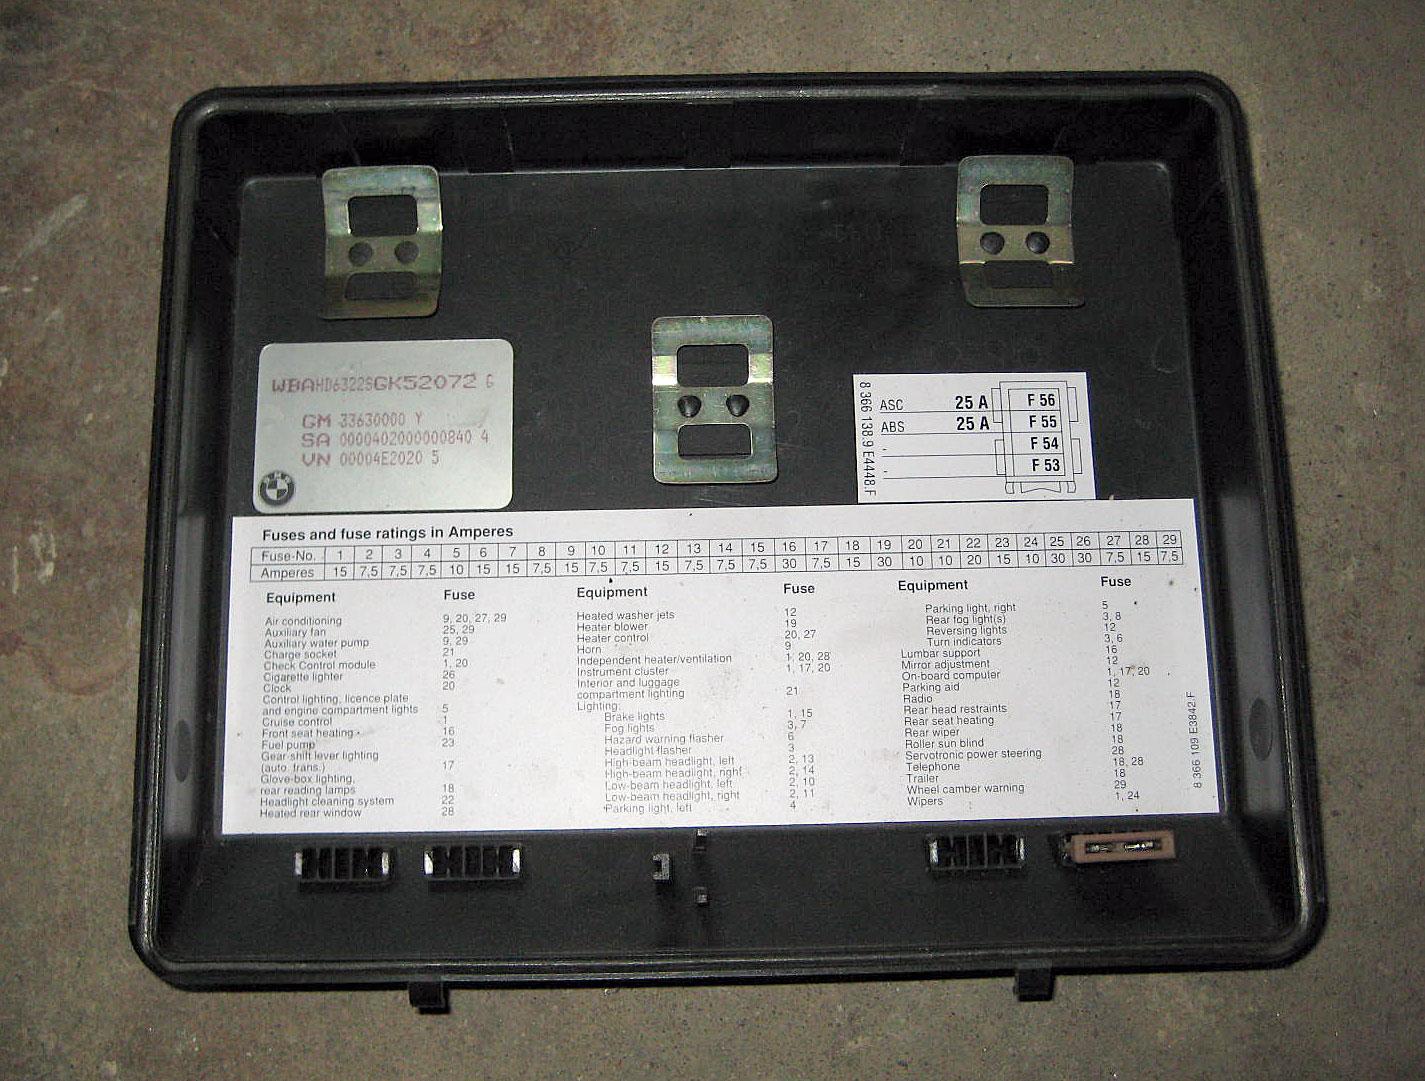 2001 Bmw 525i Fuse Box Location I Forums Similiar 1990 Dodge Caravan Diagram Il Image Wiring 1995 E34 Printable Database